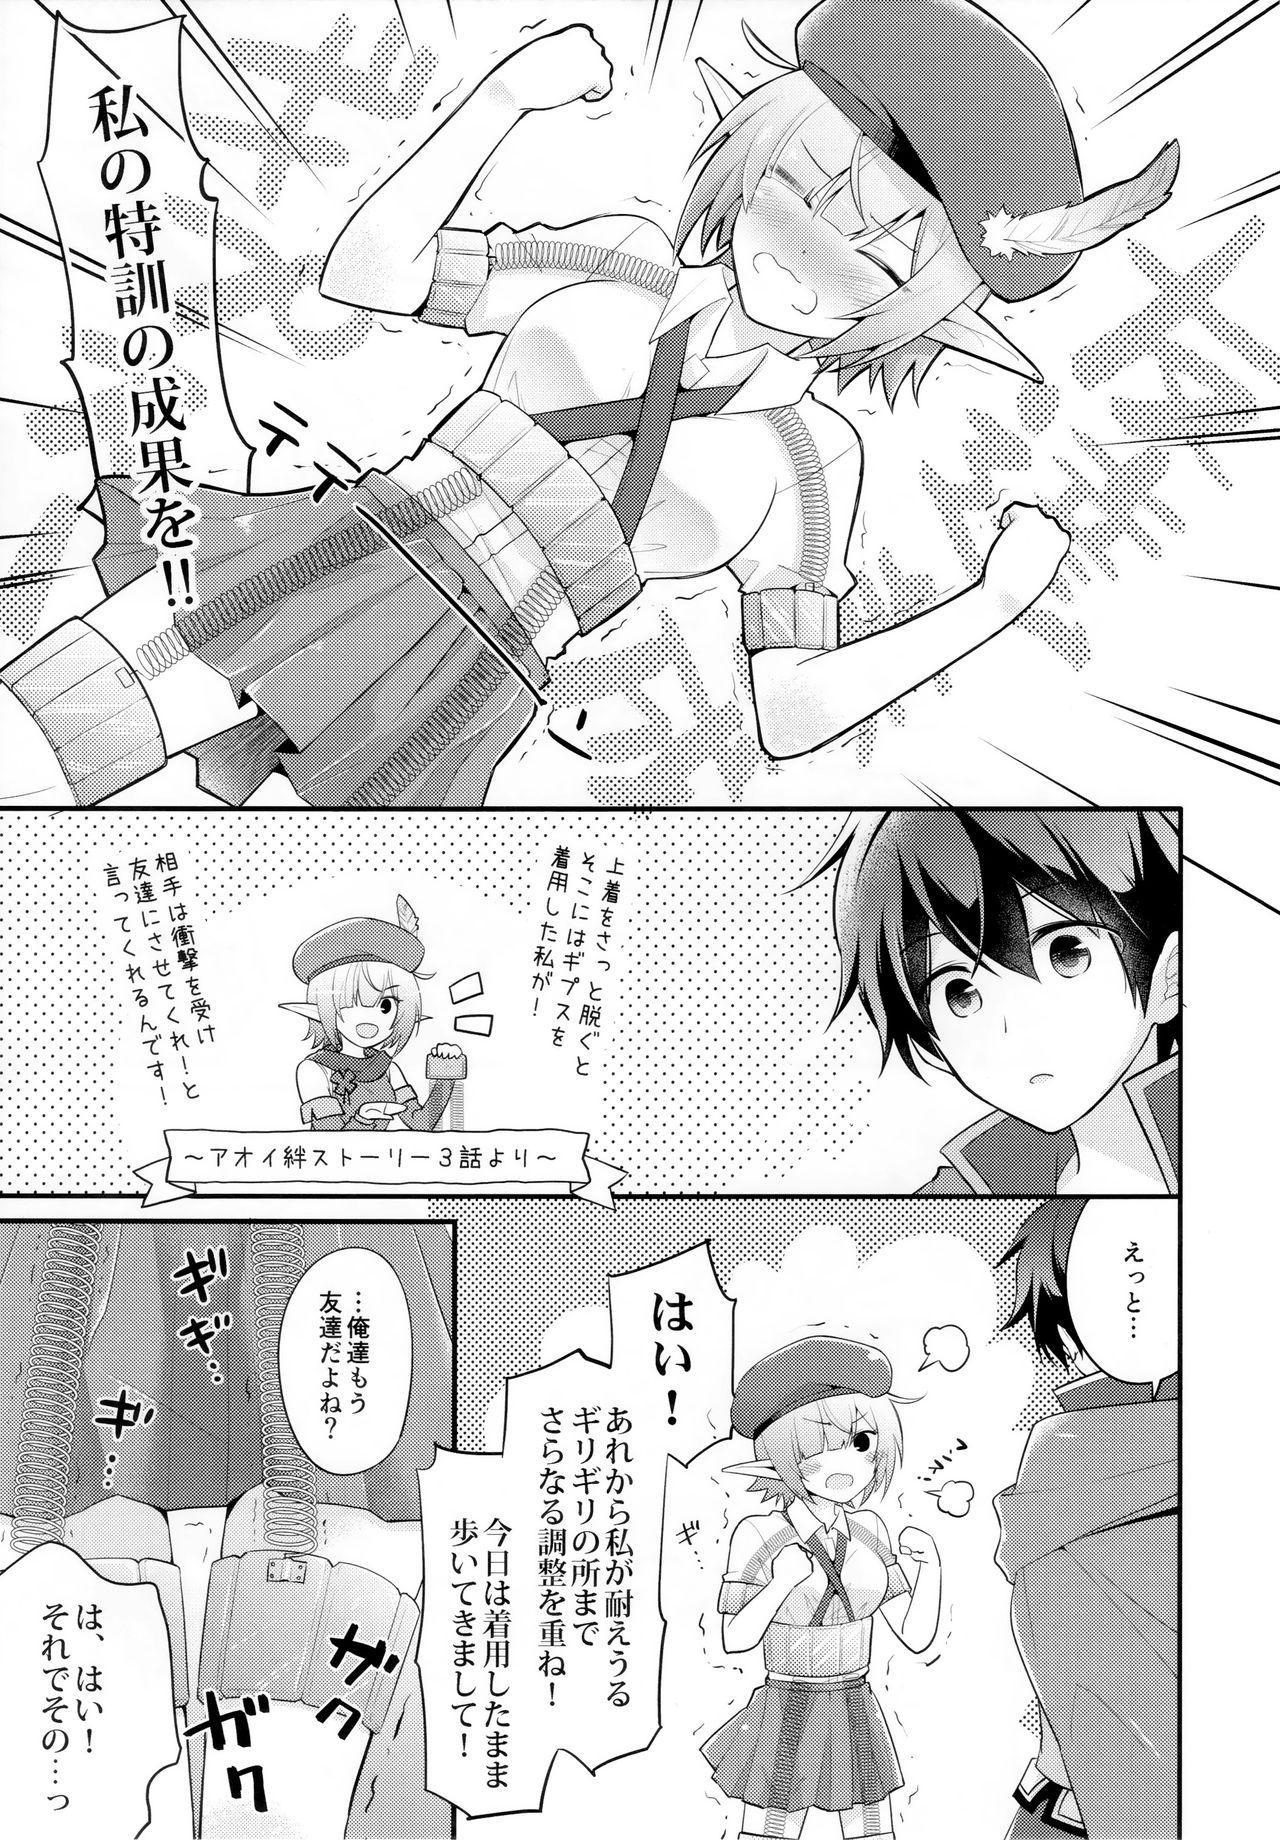 Aoi no Motto Otomodachi Daisakusen 9